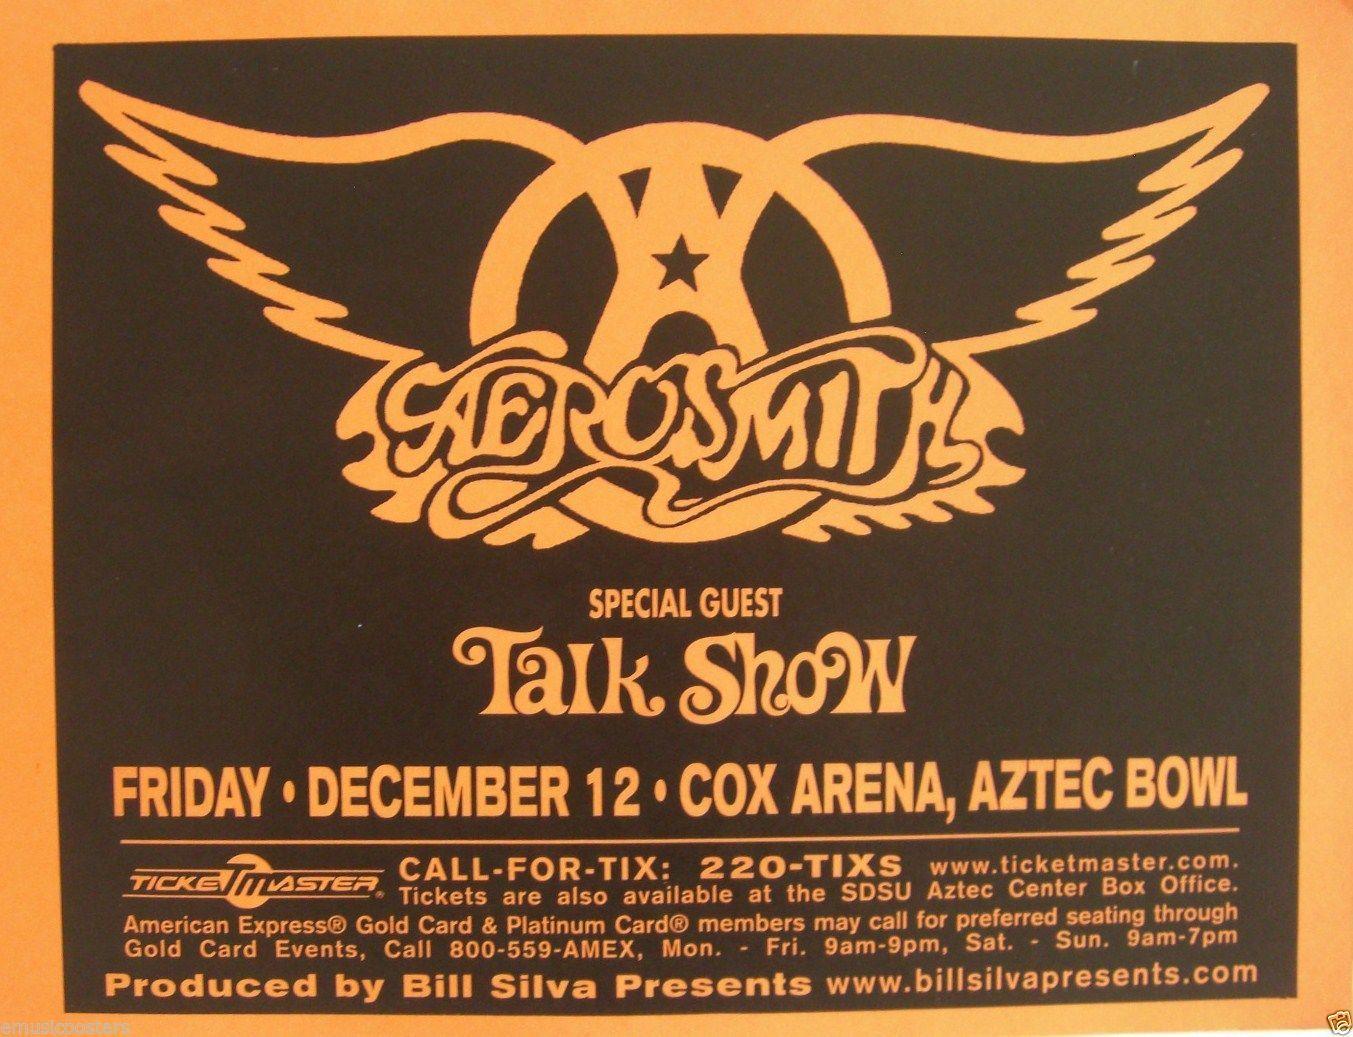 Vintage Aerosmith Poster Google Search Anos 70 80 90 Anos 70 Show